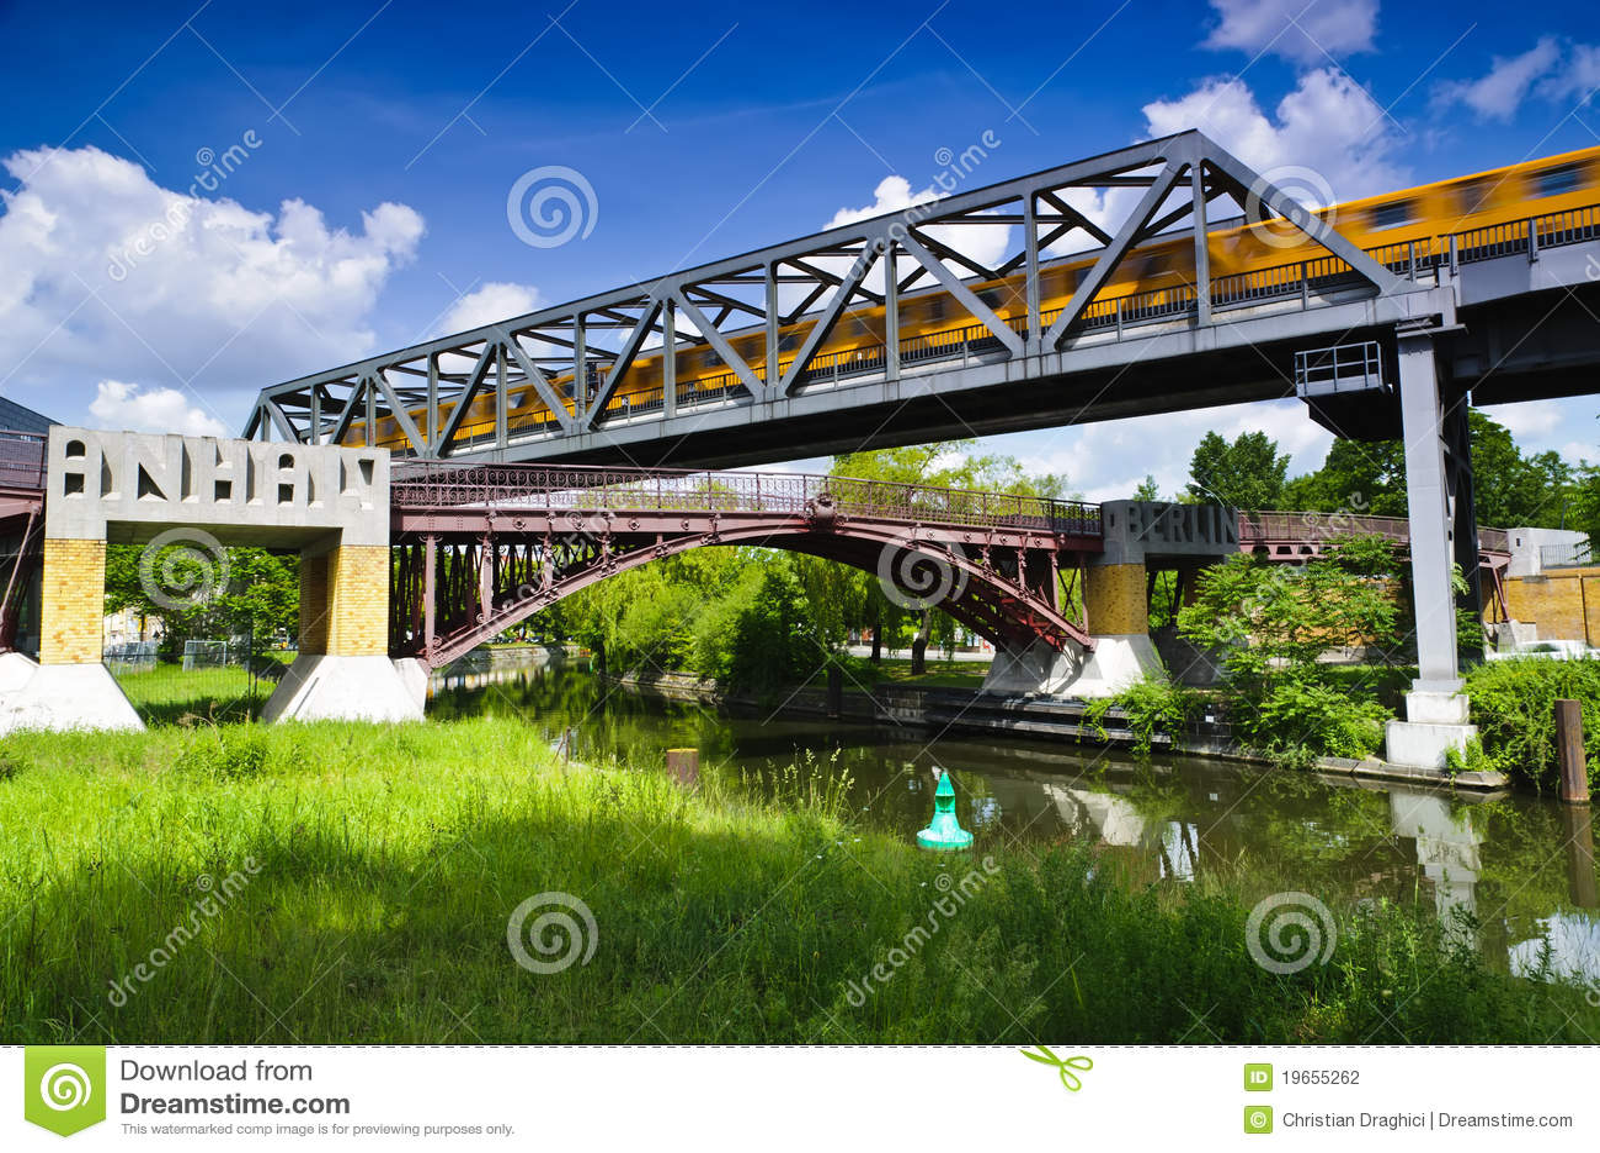 Steg footbridge berlin anhalter